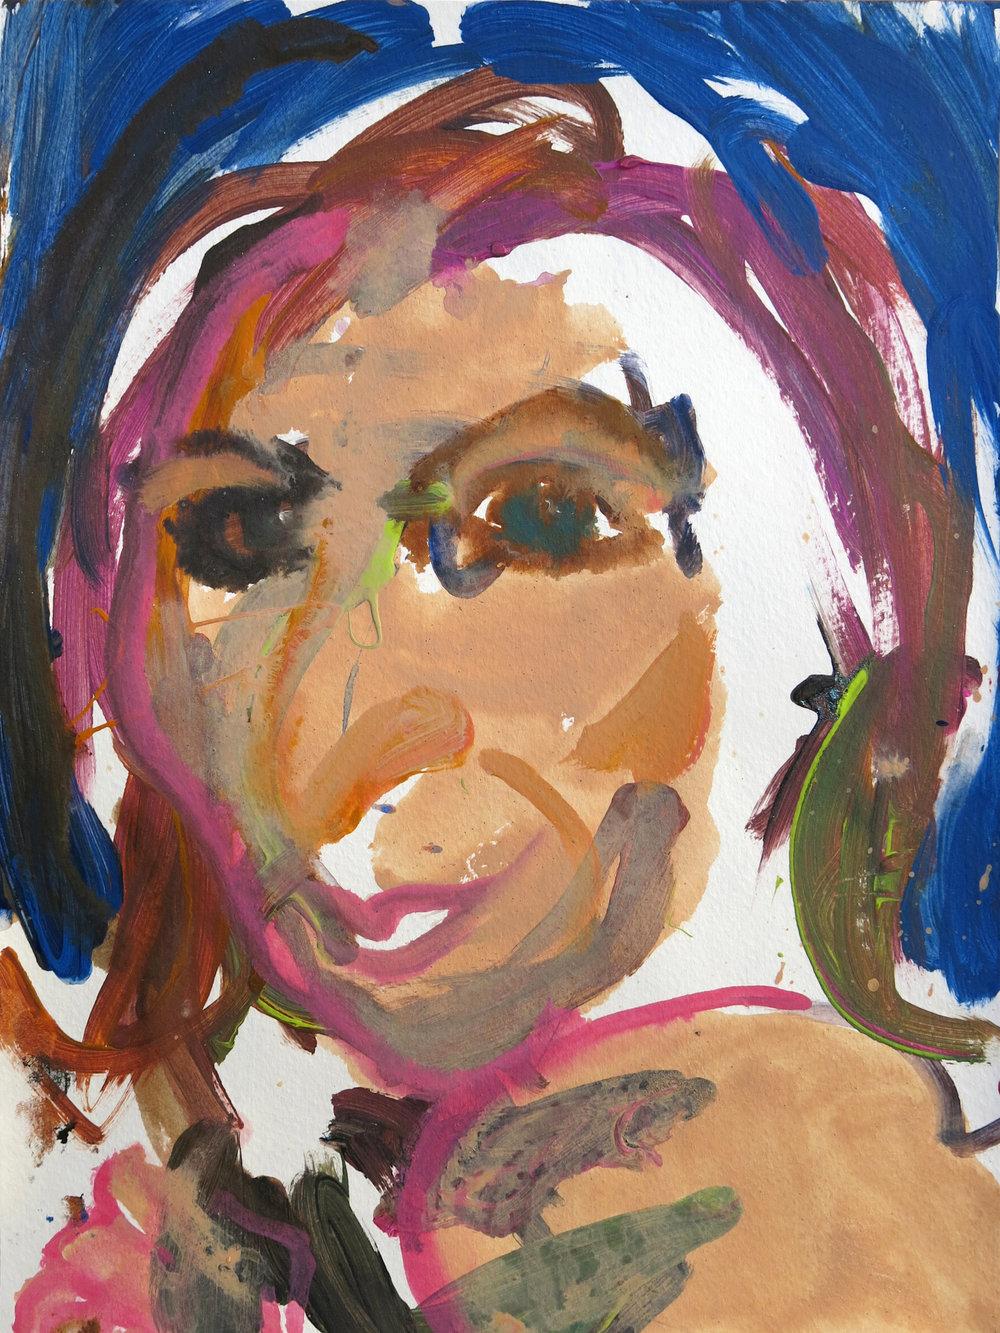 Barbra Streisand Portrait #17